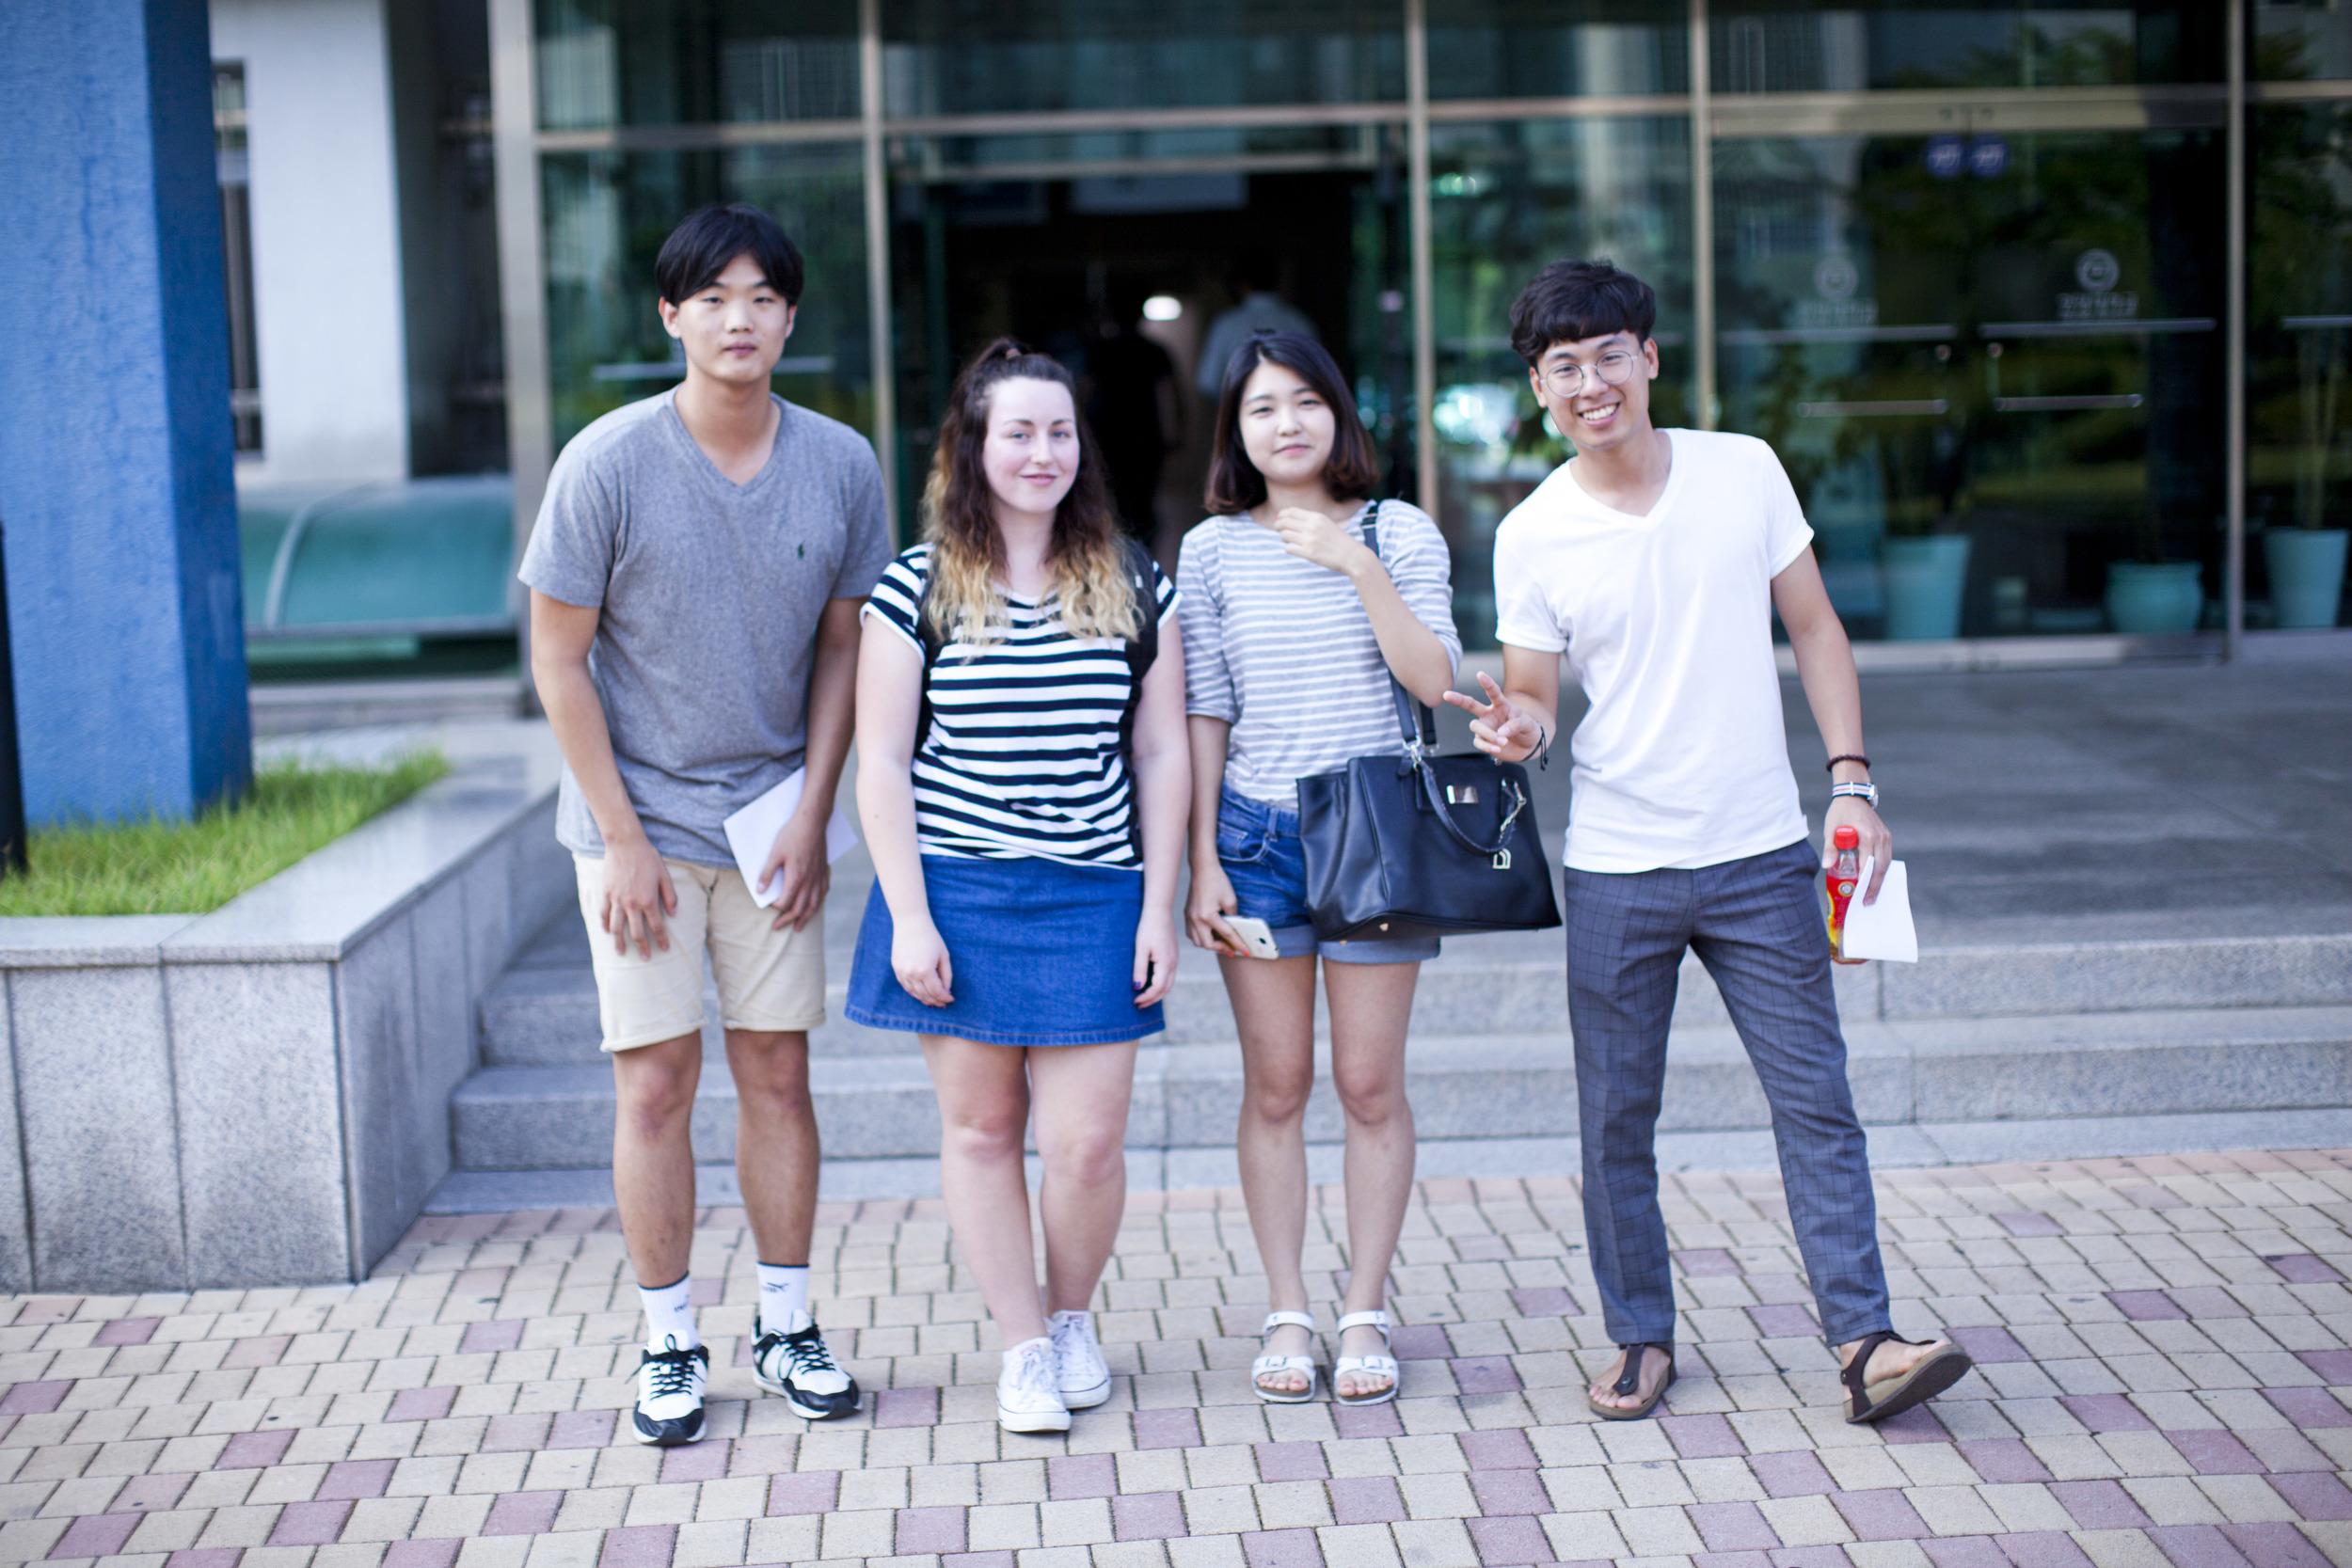 Song Min, Liz, Myeong Hui and Sung Bae